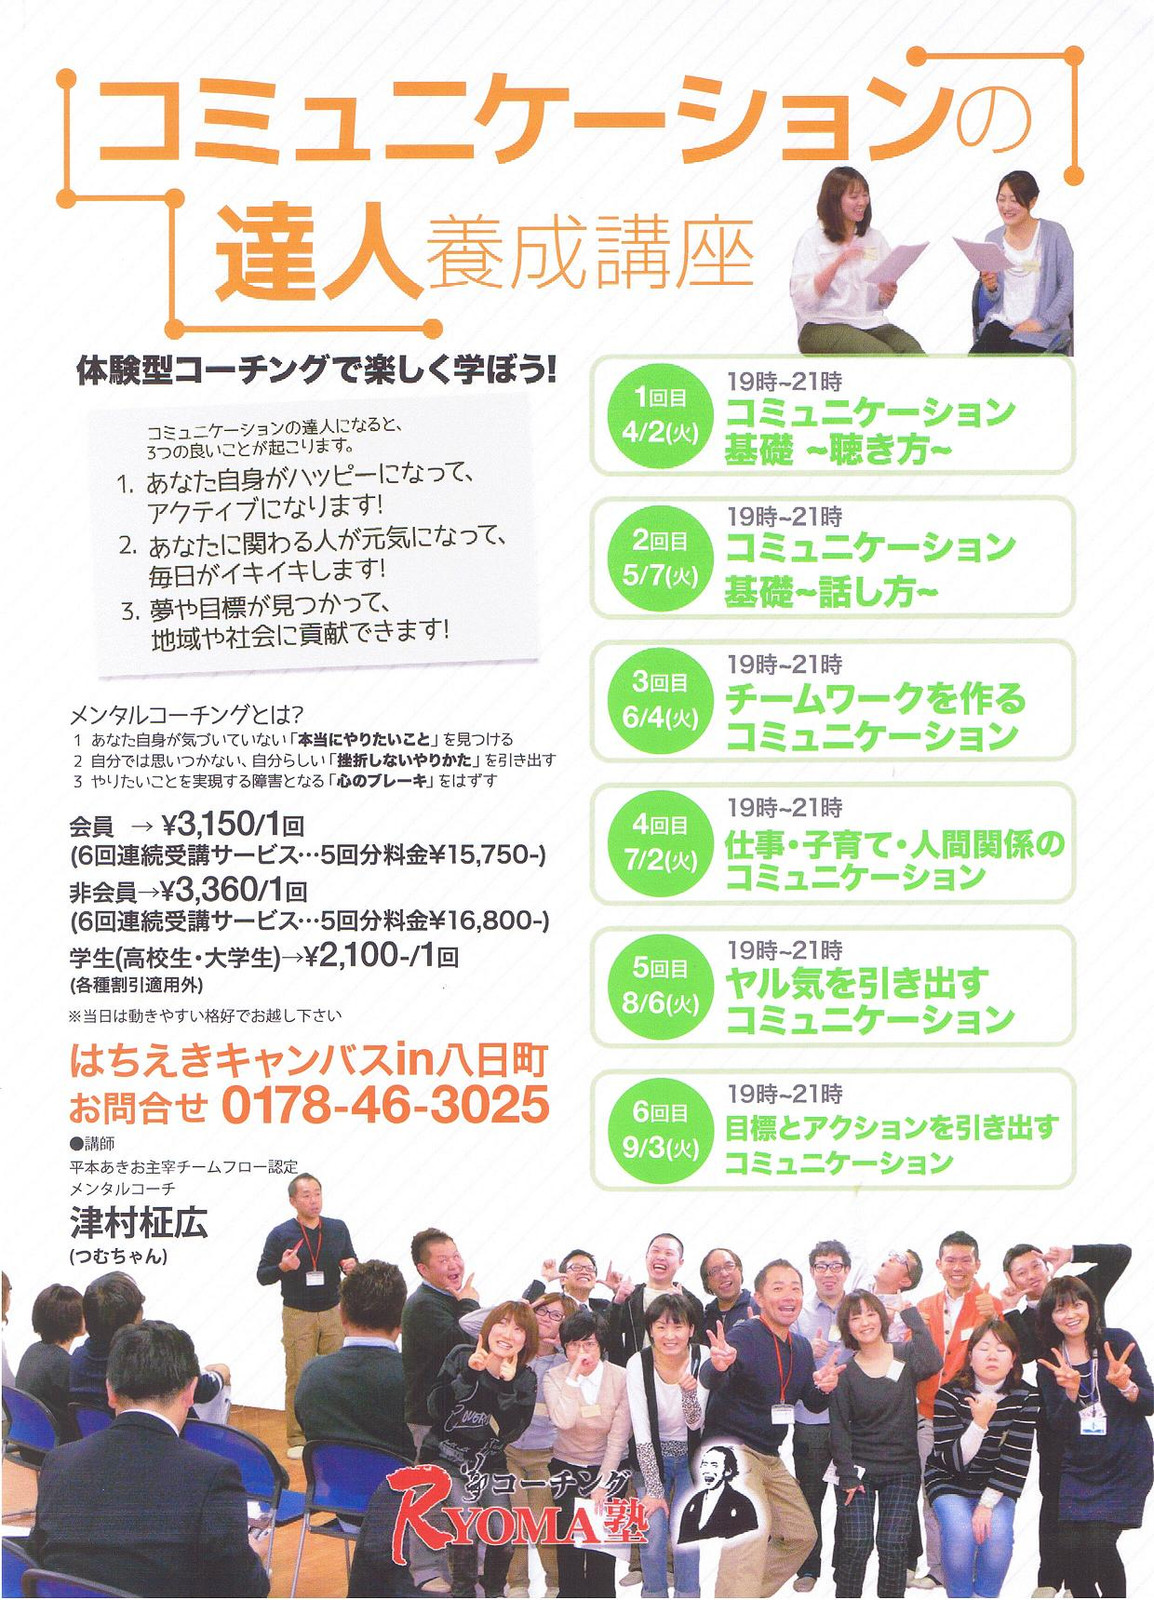 Ccf20130325_00005